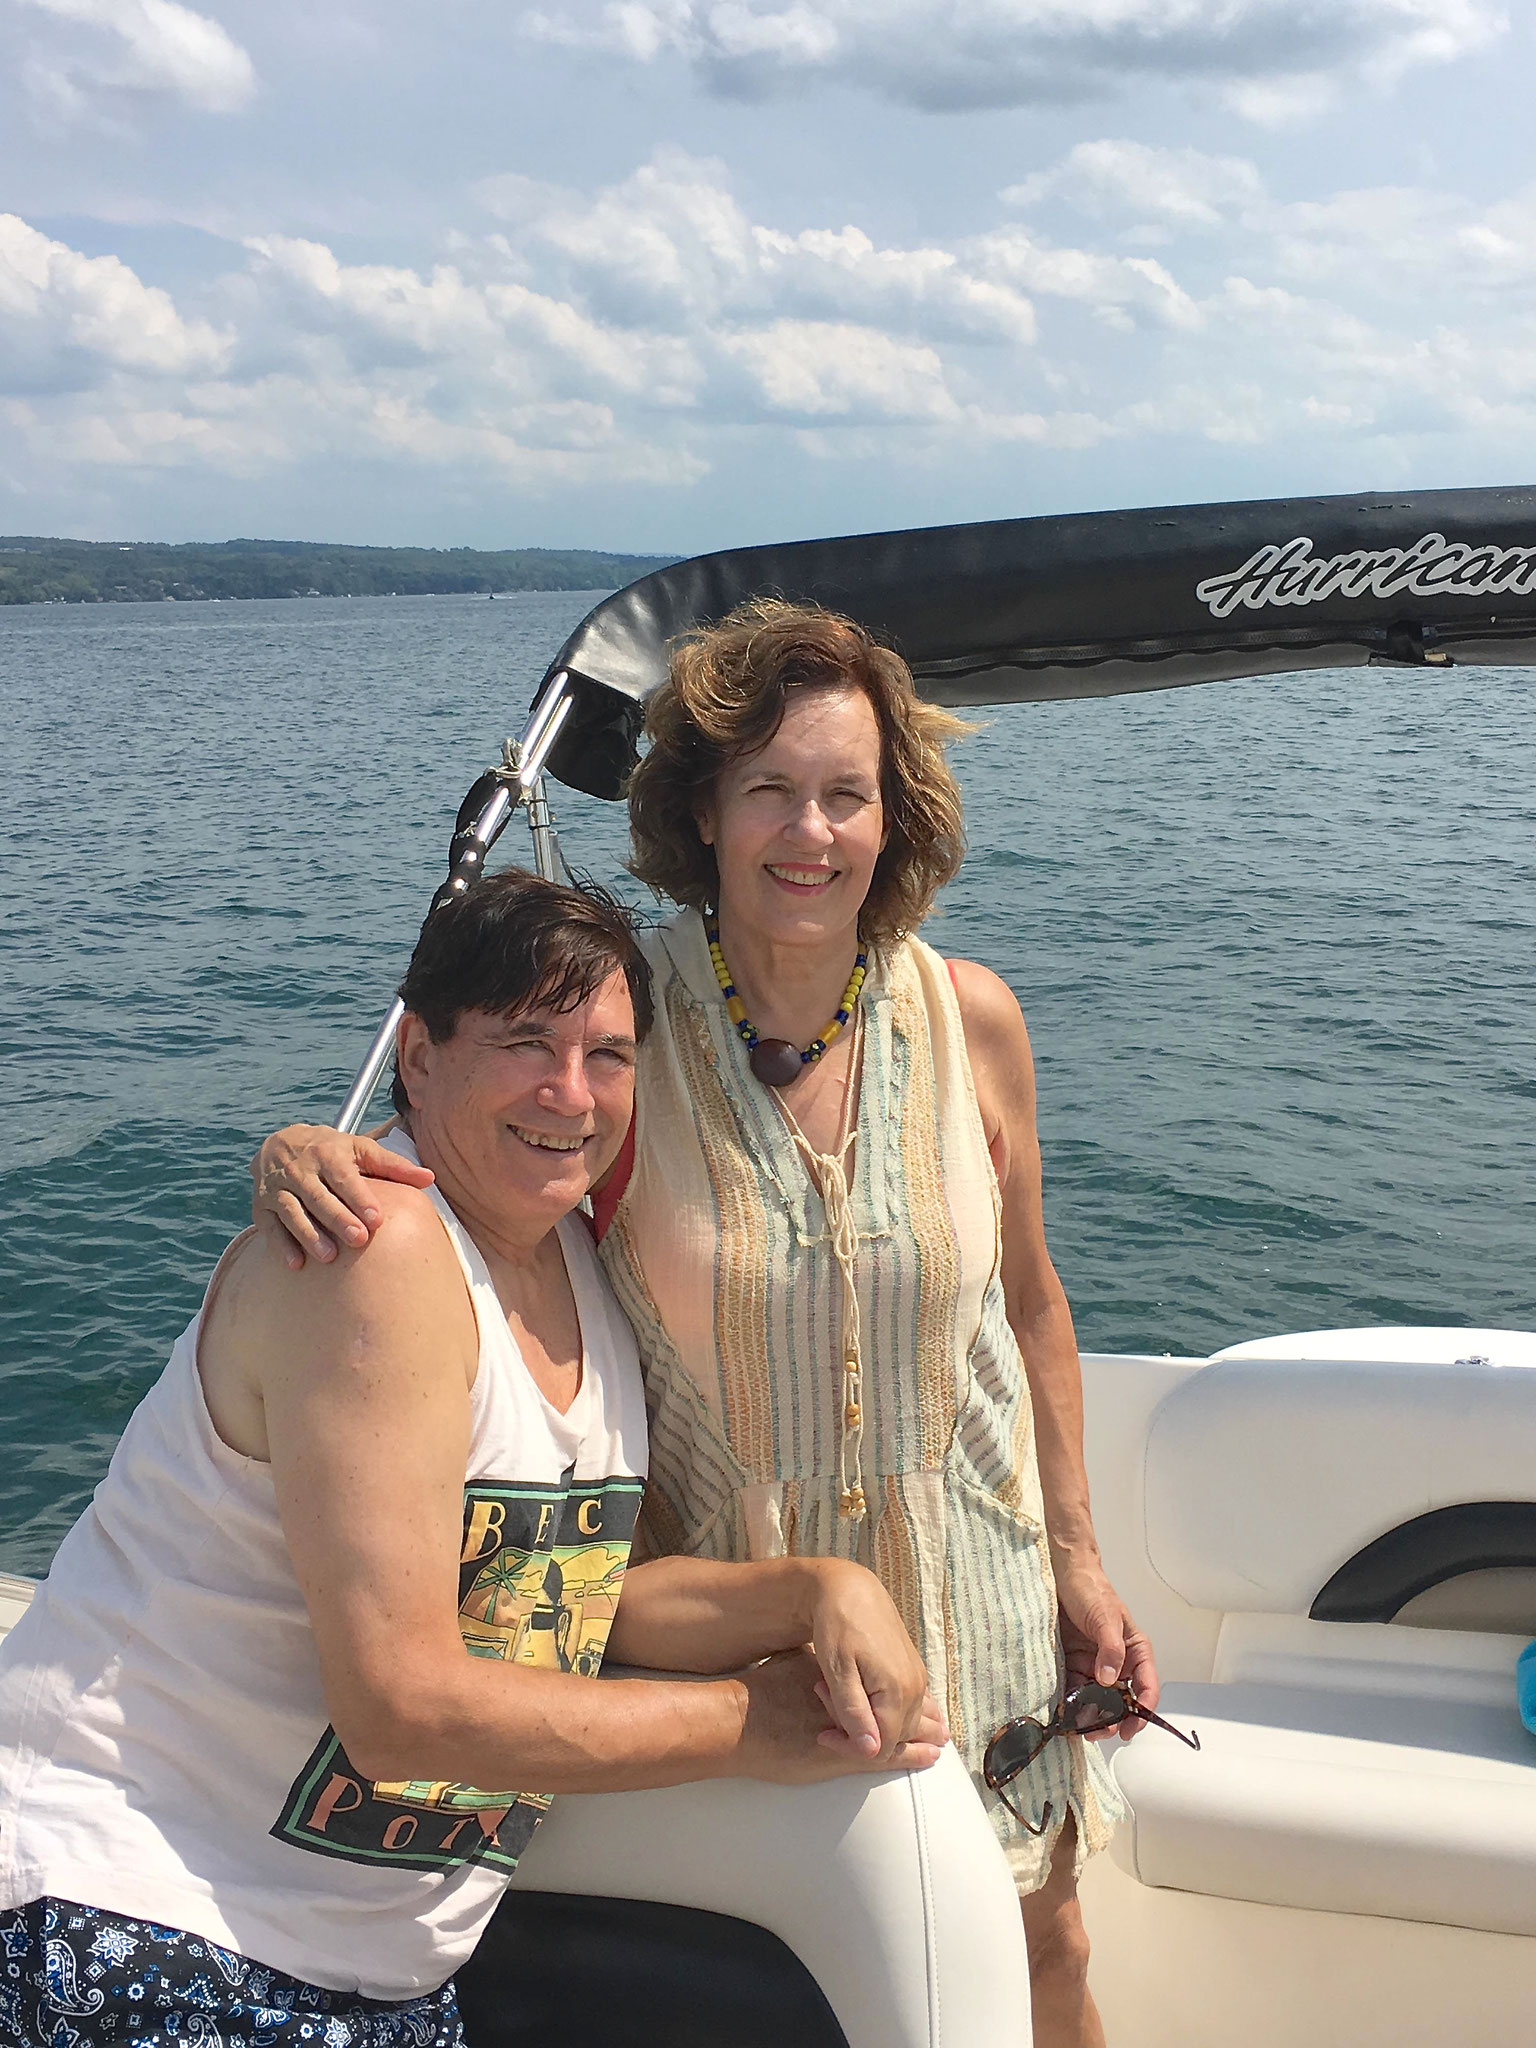 John & Lorraine at Skaneateles Lake, 8-17